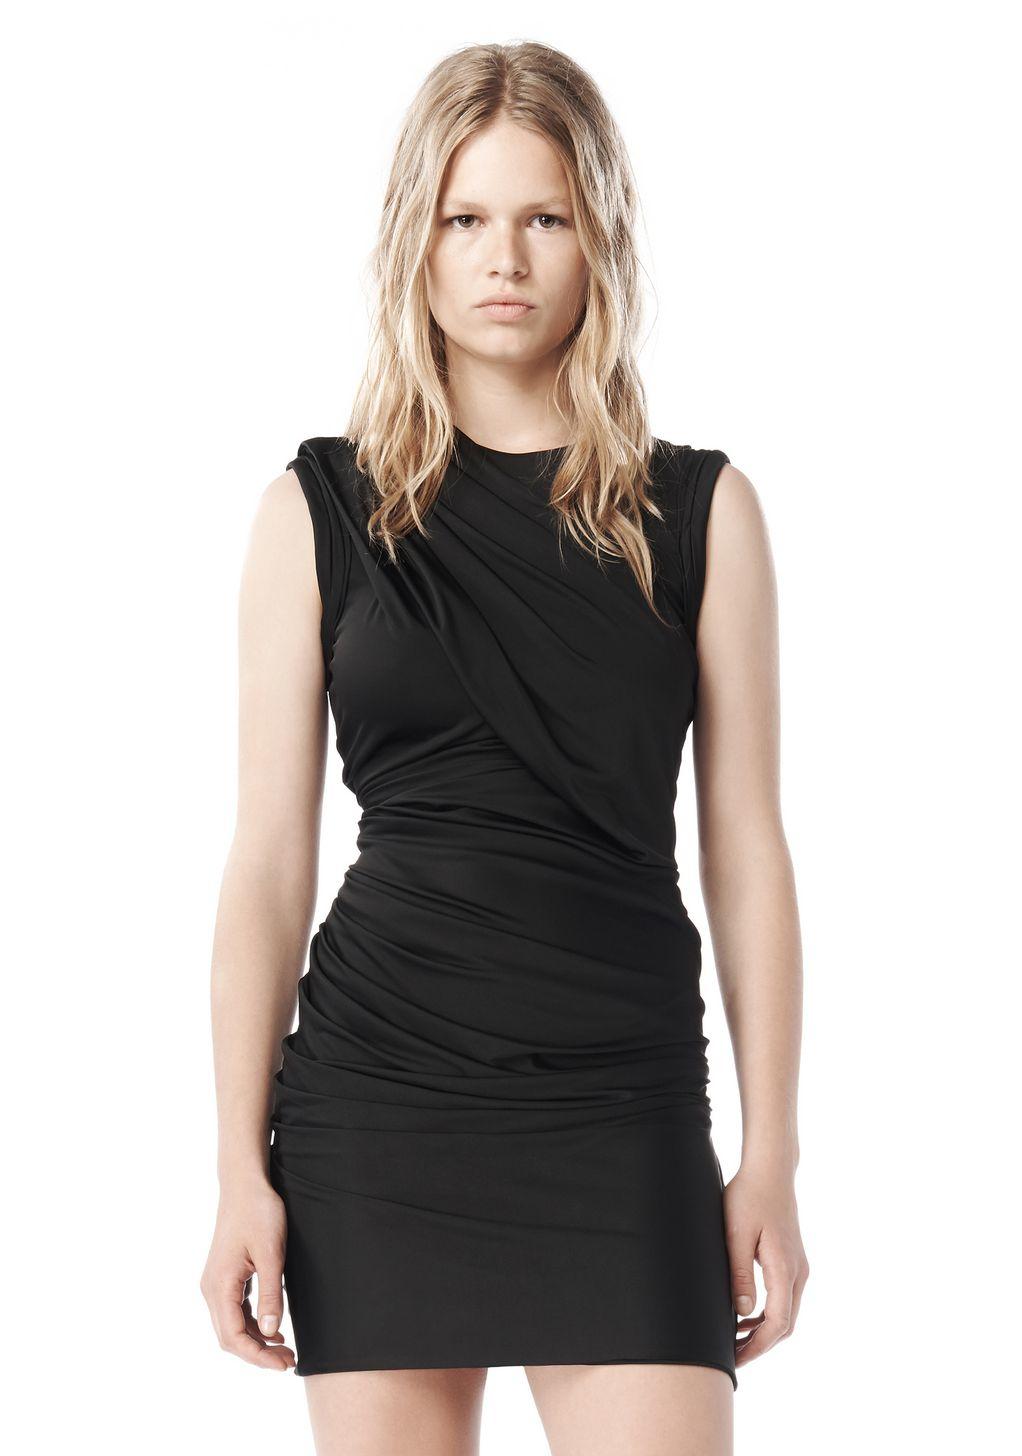 Lyst - Alexander Wang Spring 2009 Draped Jersey Dress in Black